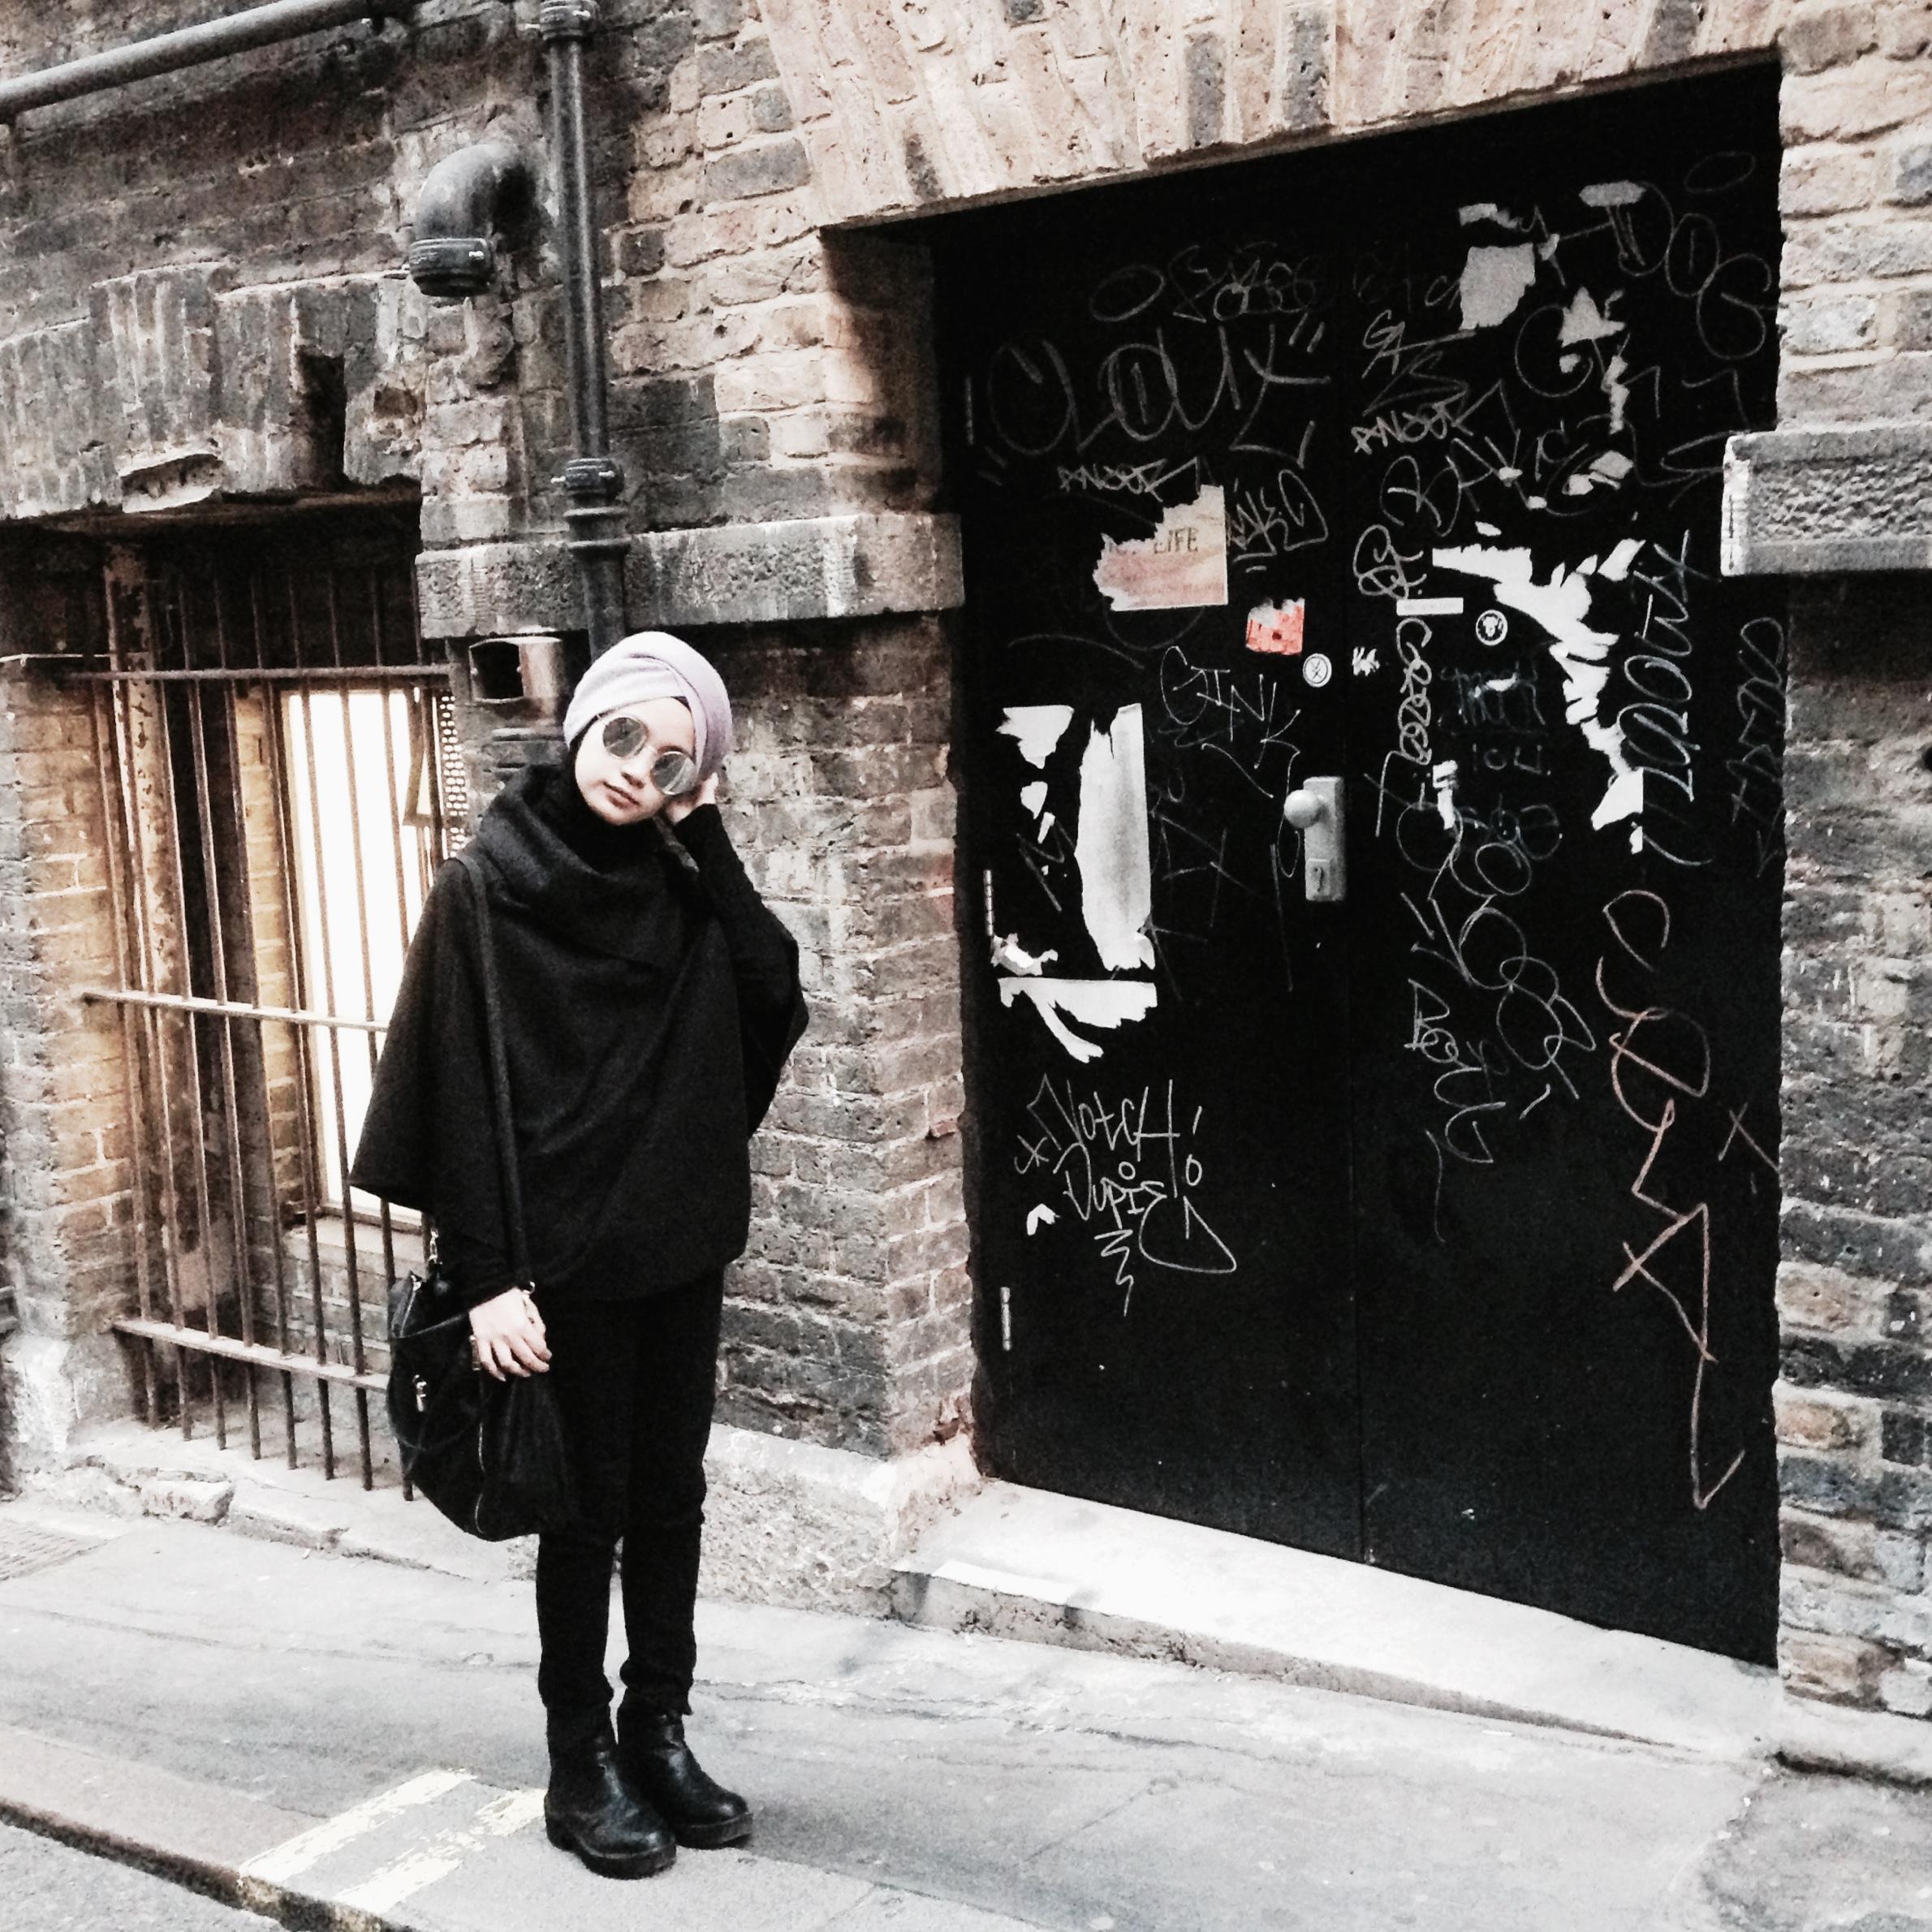 London, Sept 2014